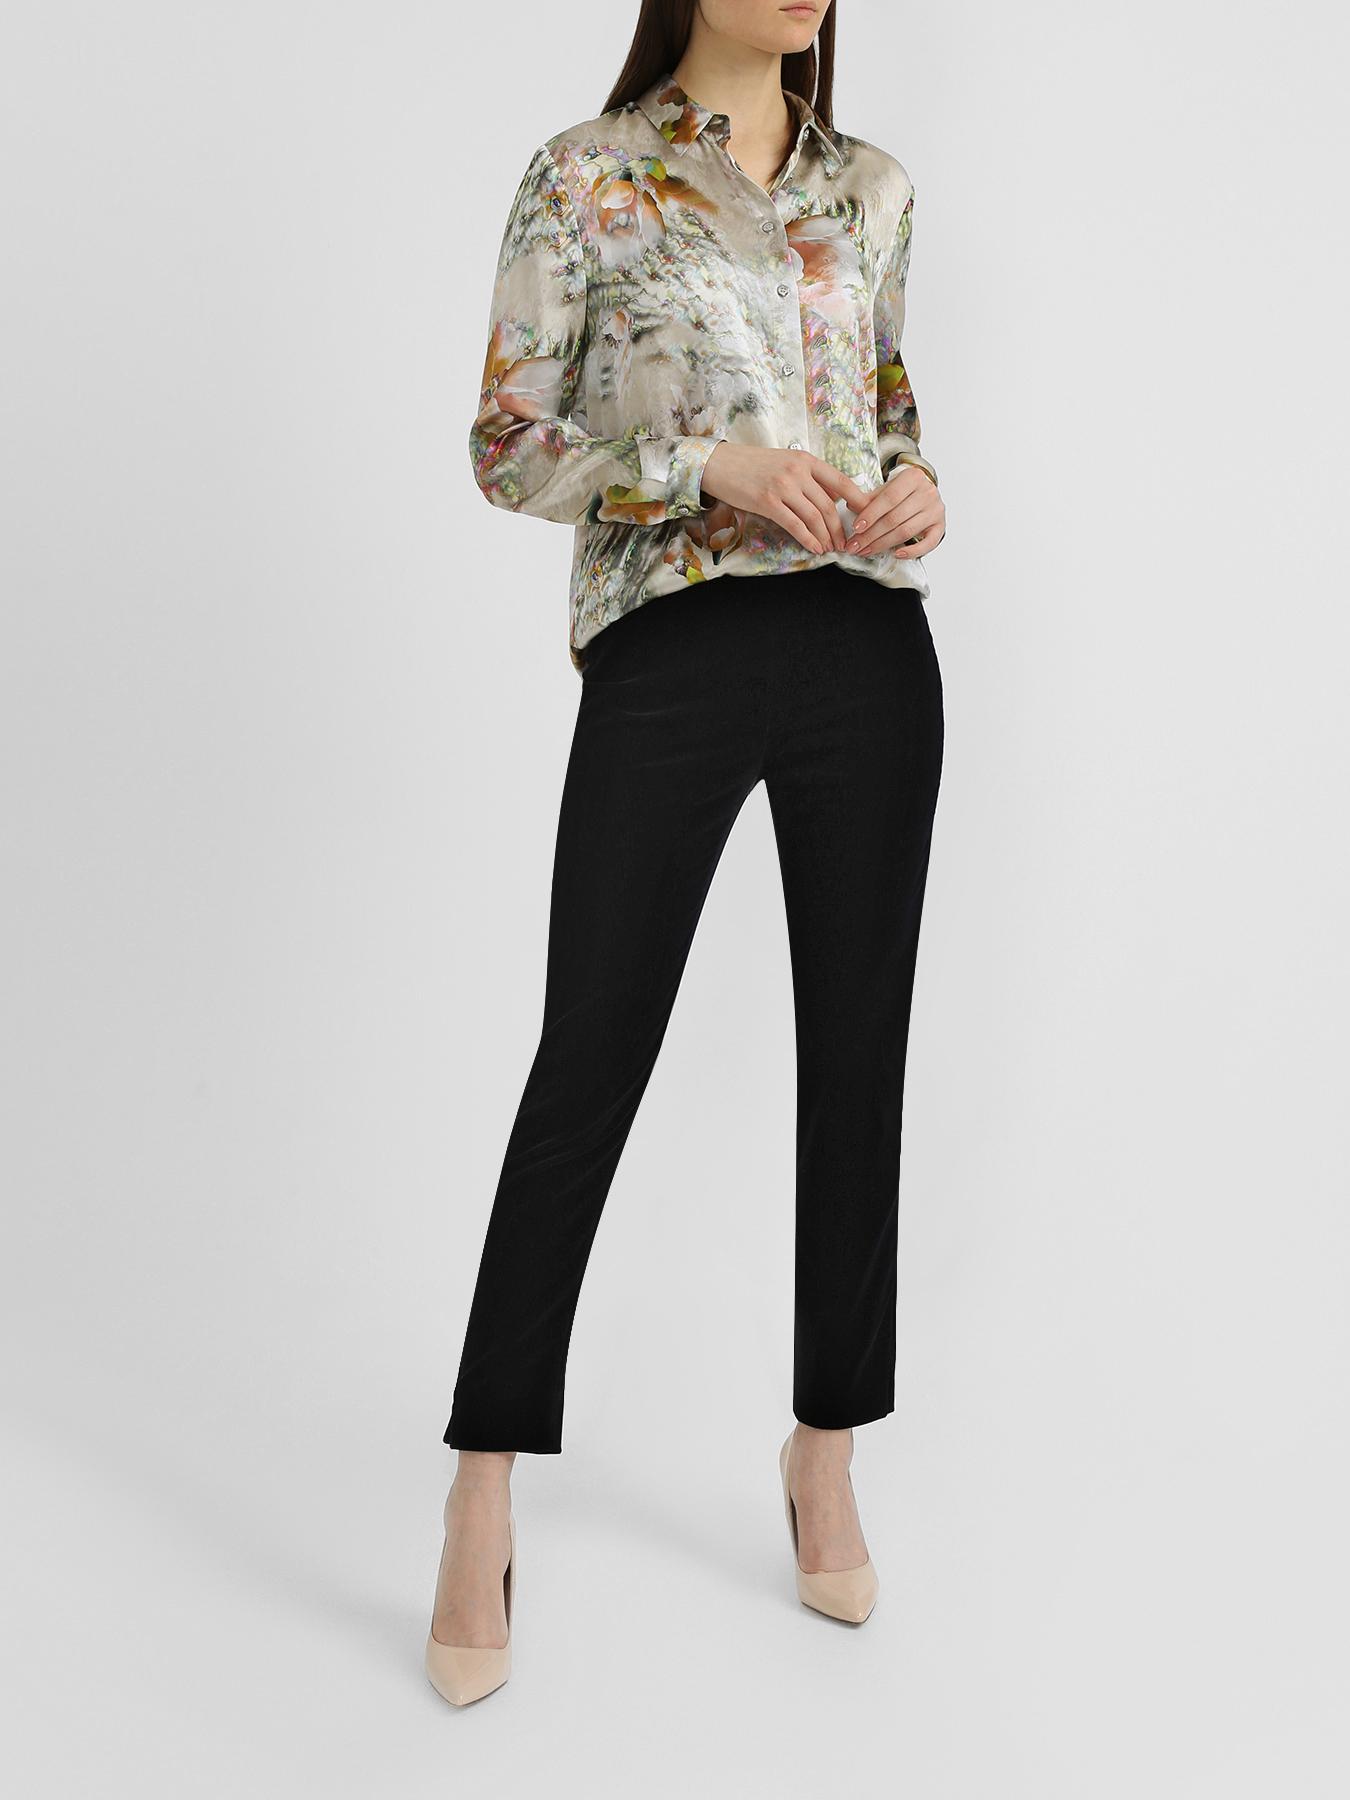 Блузка Korpo Collezioni Шелковая рубашка с цветочным узором